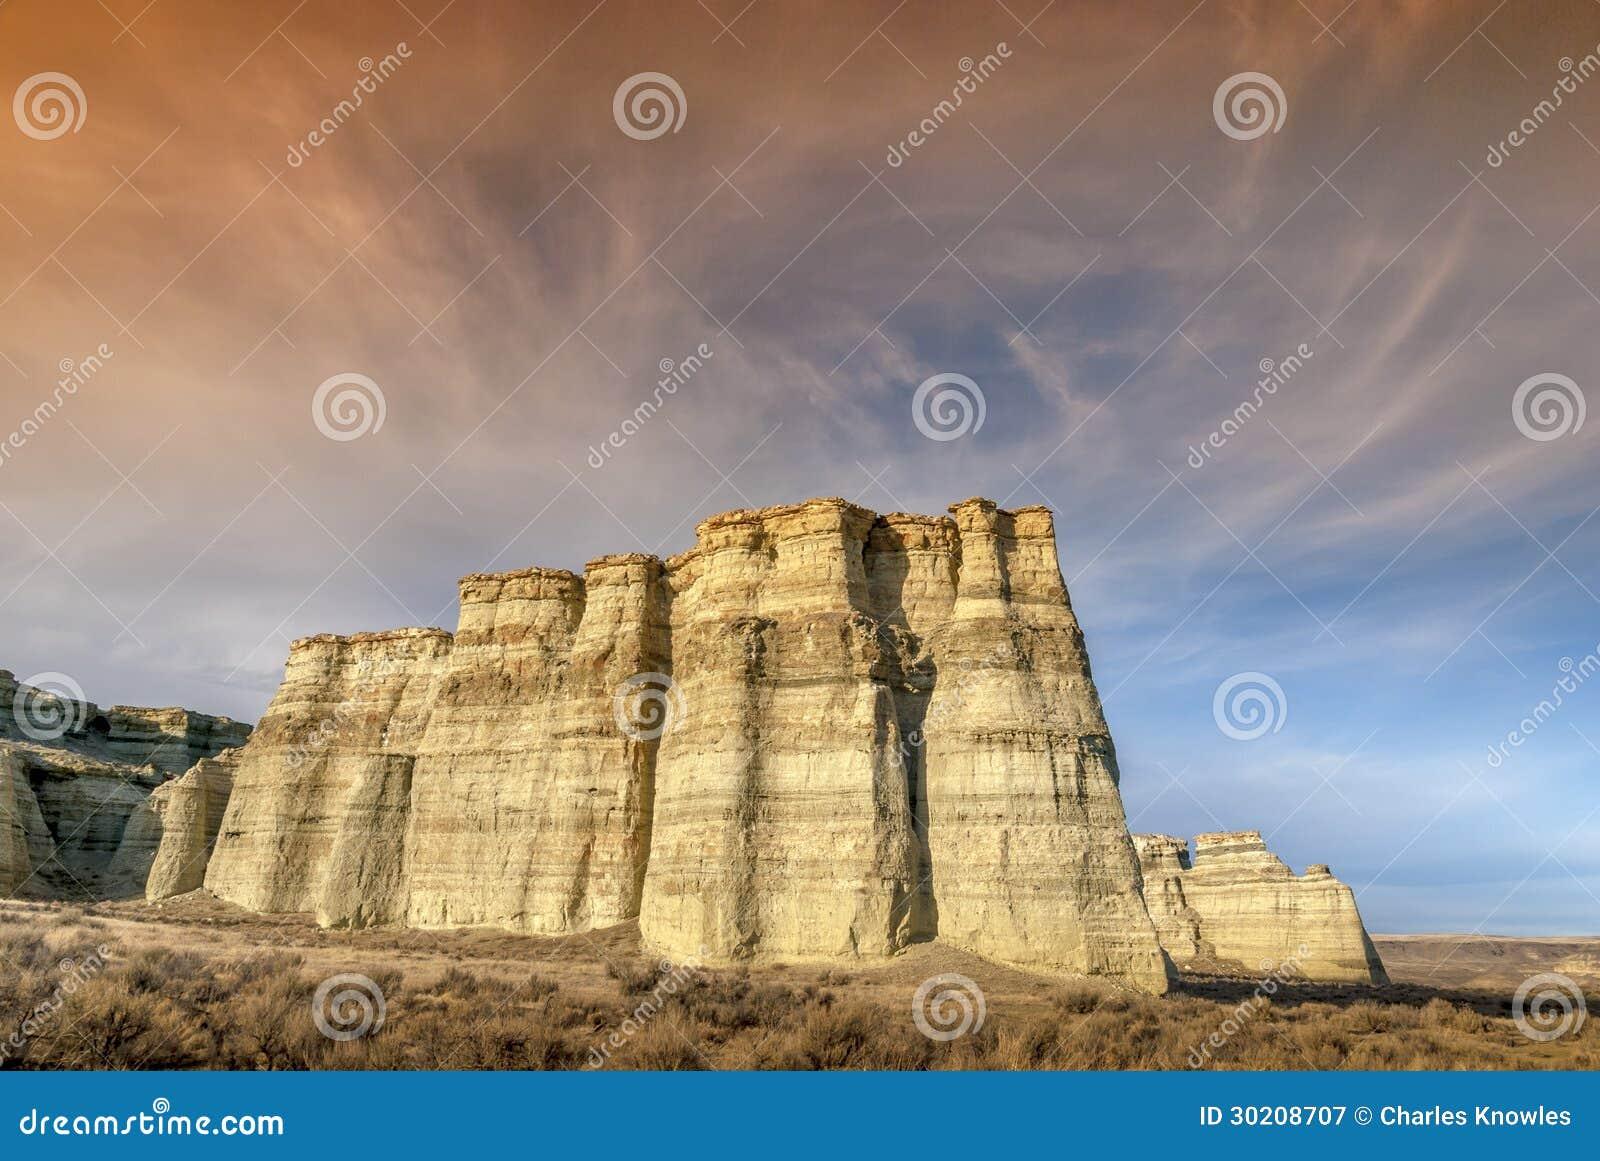 Desert Rock Pillars : Rome oregon pillars at sunset royalty free stock